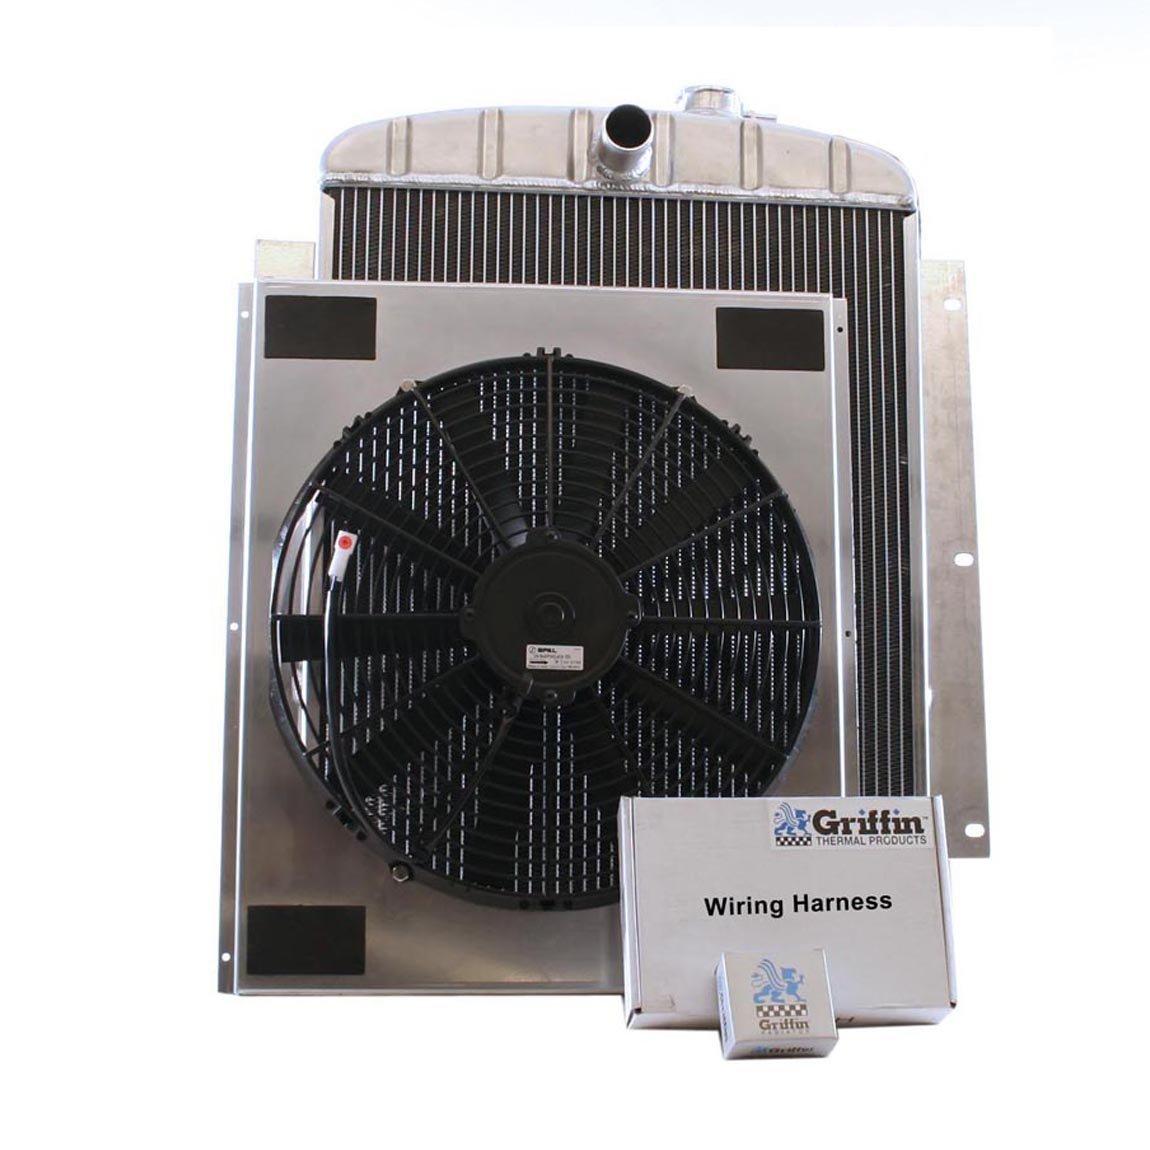 Griffin Radiator CU-70056 ComboUnit Radiator and Electric Fan Kit